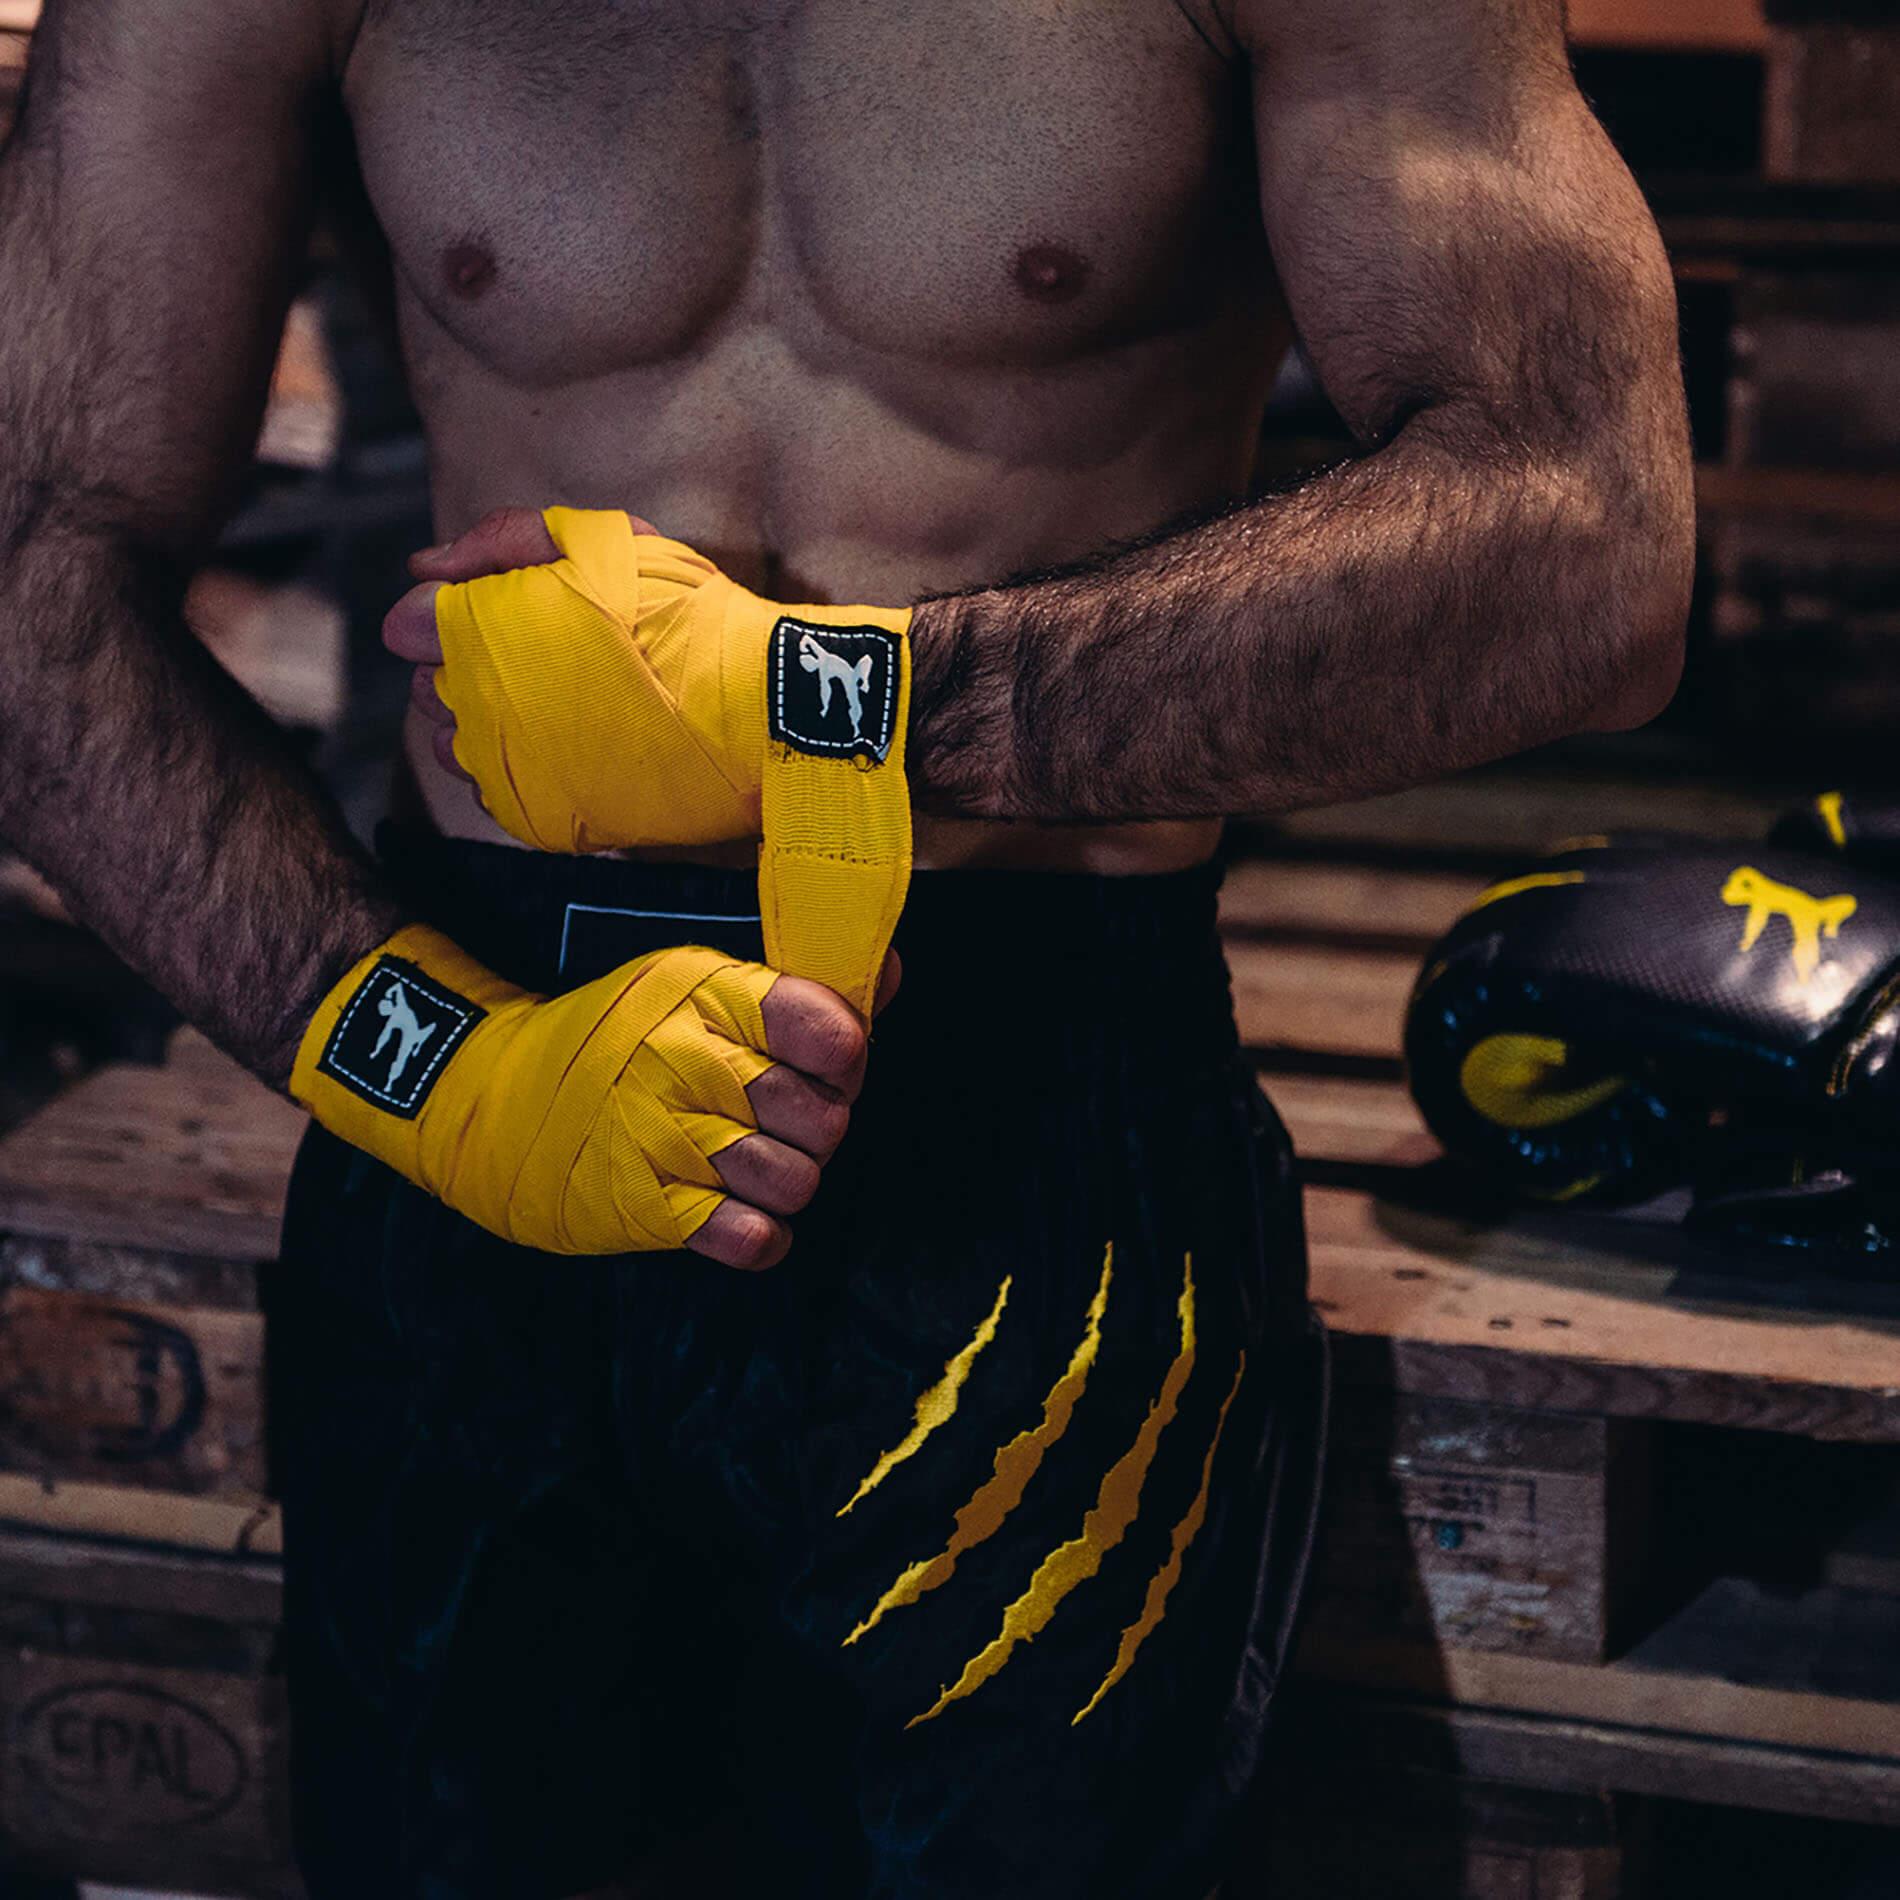 Boxing Wraps 250 cm, Pair (Multiple colors) - Yellow